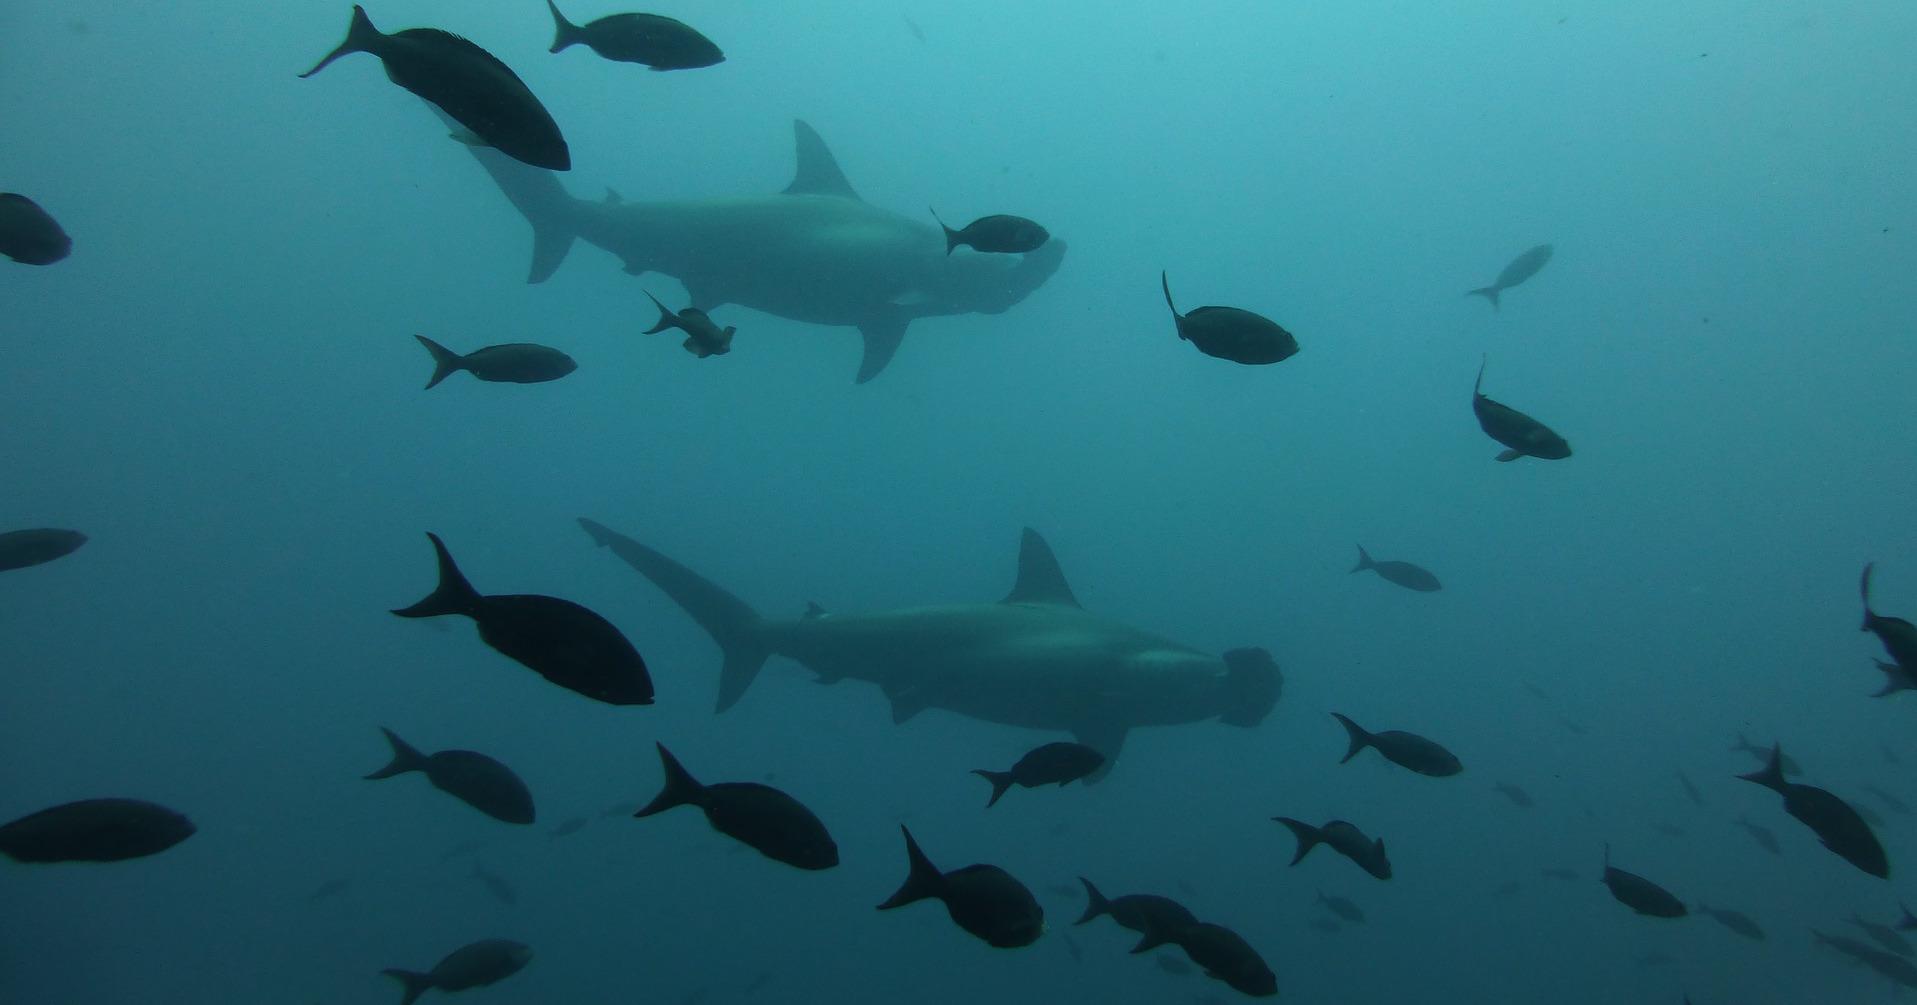 hammerhead-shark-891290_1920.jpg